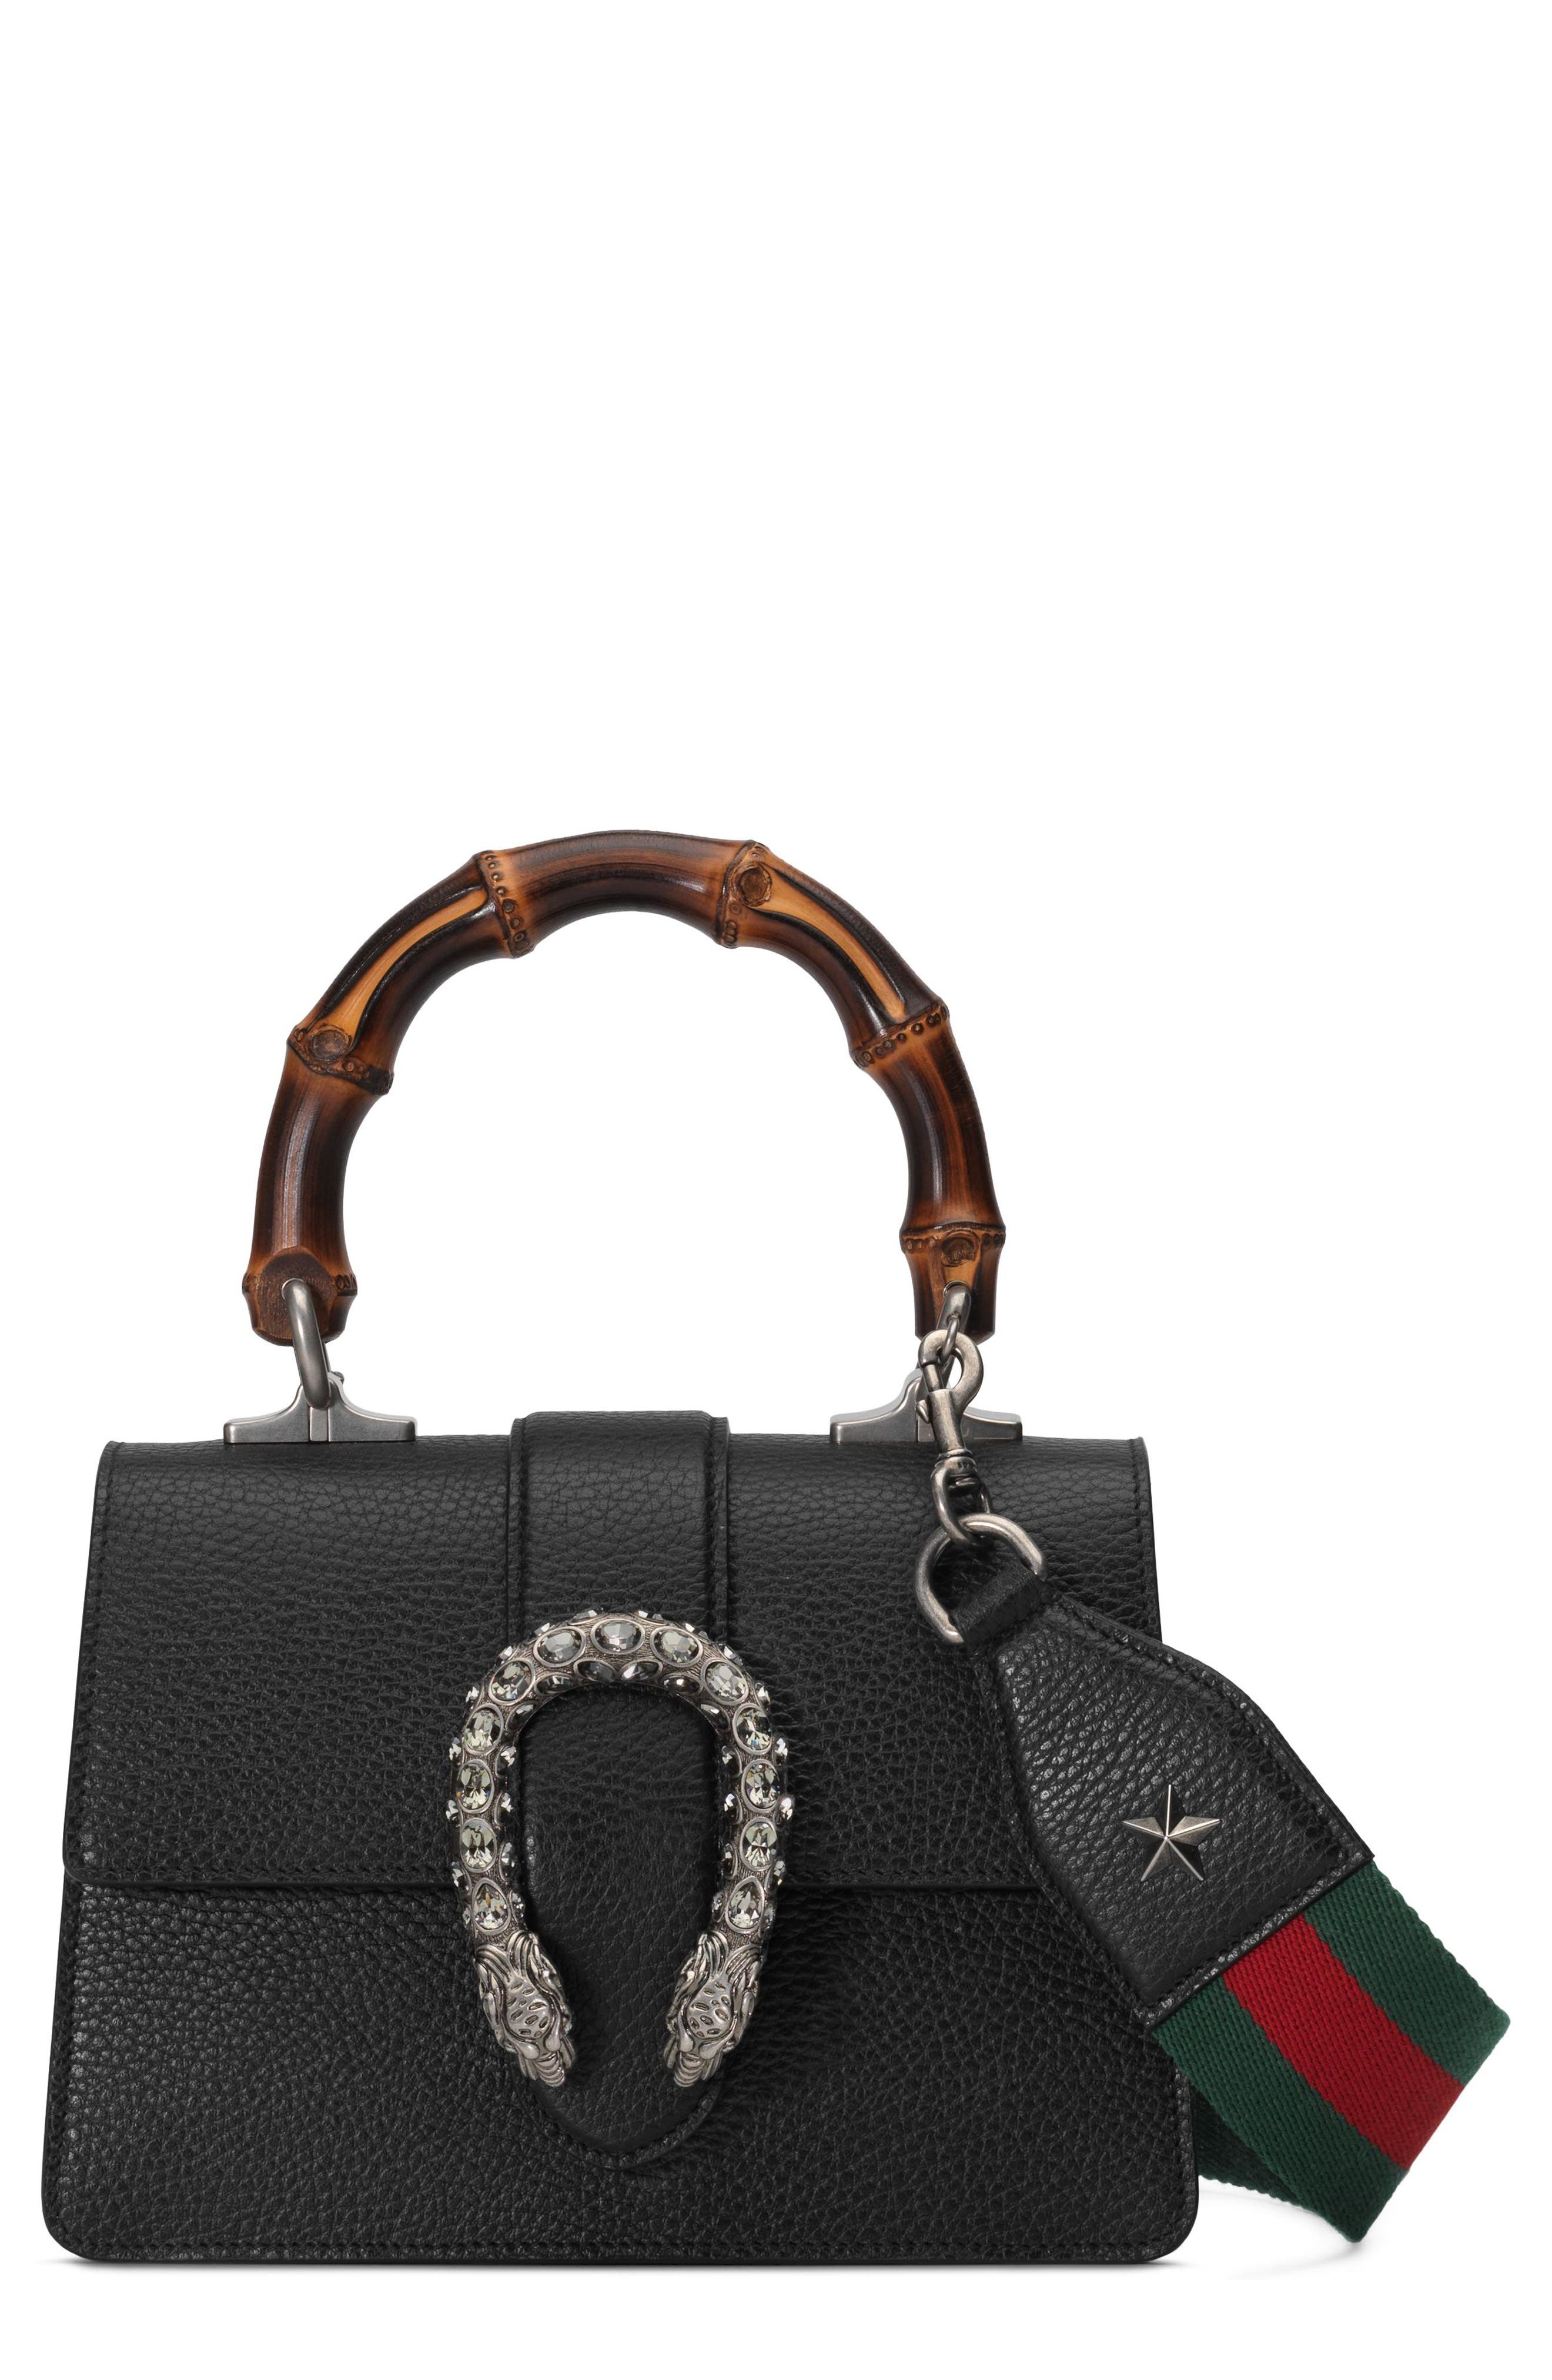 Mini Dionysus Leather Top Handle Satchel,                             Main thumbnail 1, color,                             NERO/ VERT RED/ BLACK DIAMOND